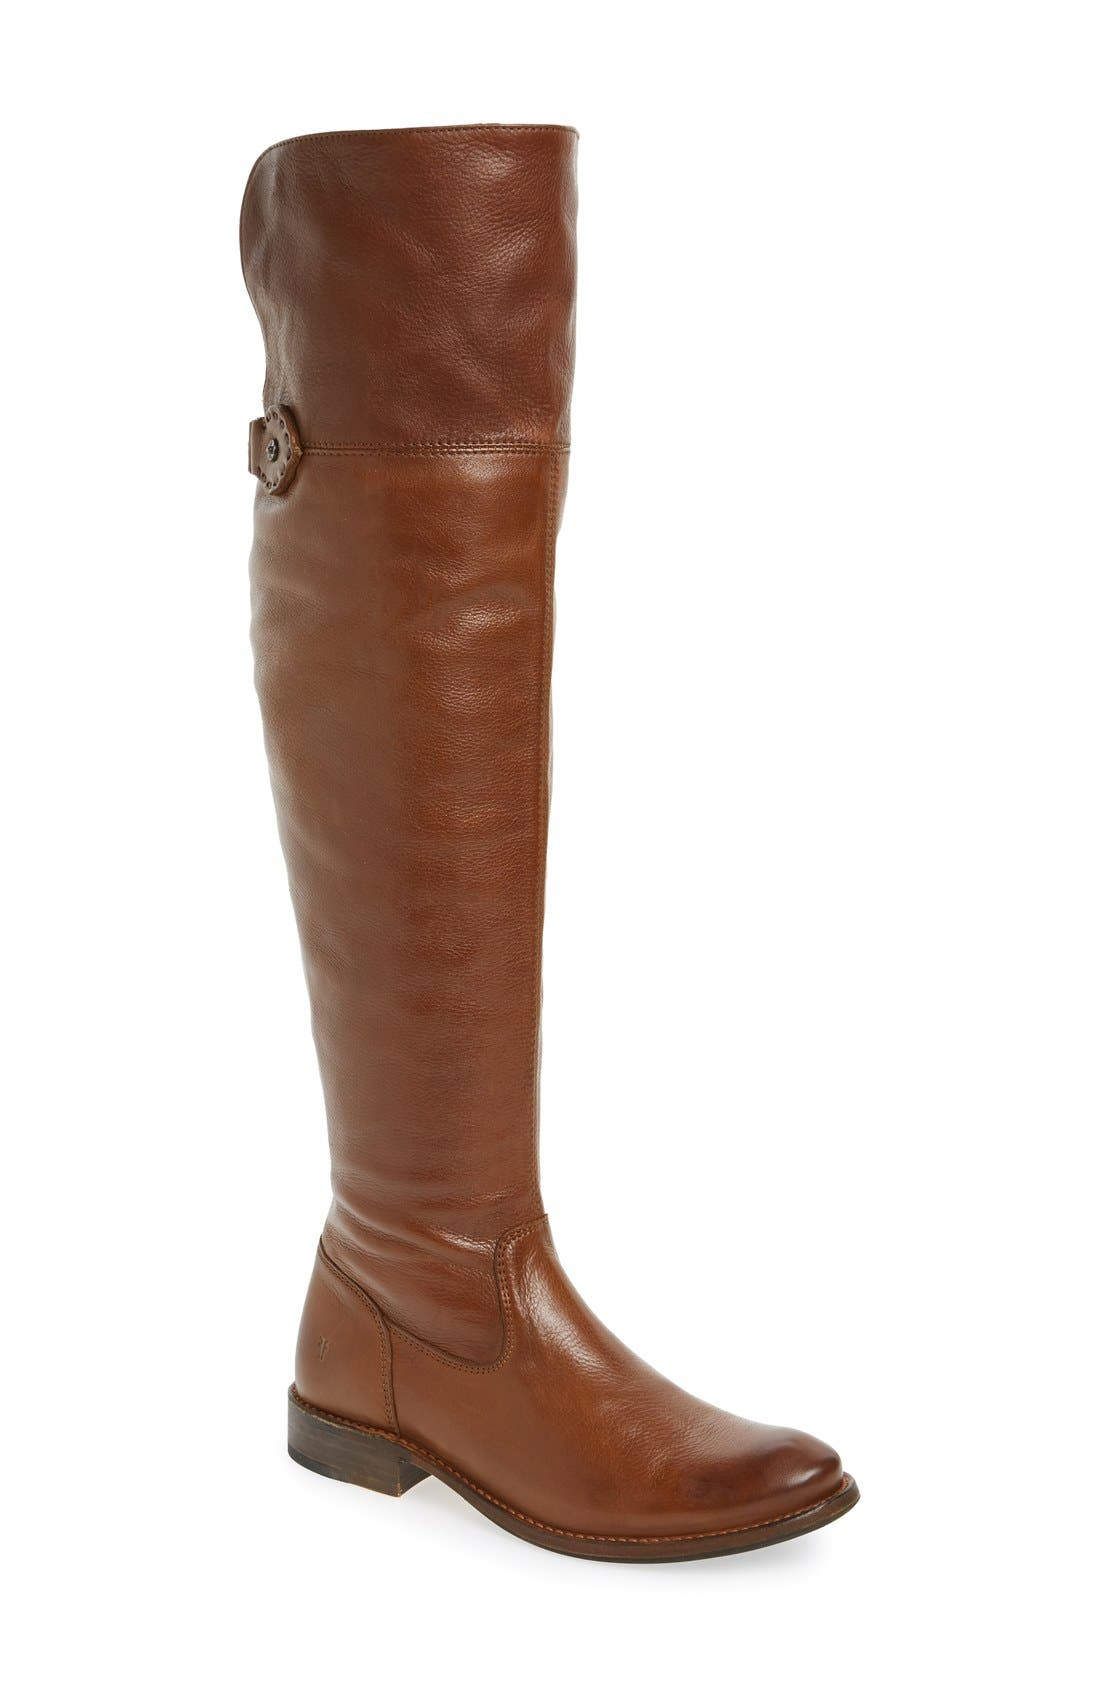 Main Image - Frye 'Shirley' Over the Knee Boot (Women)